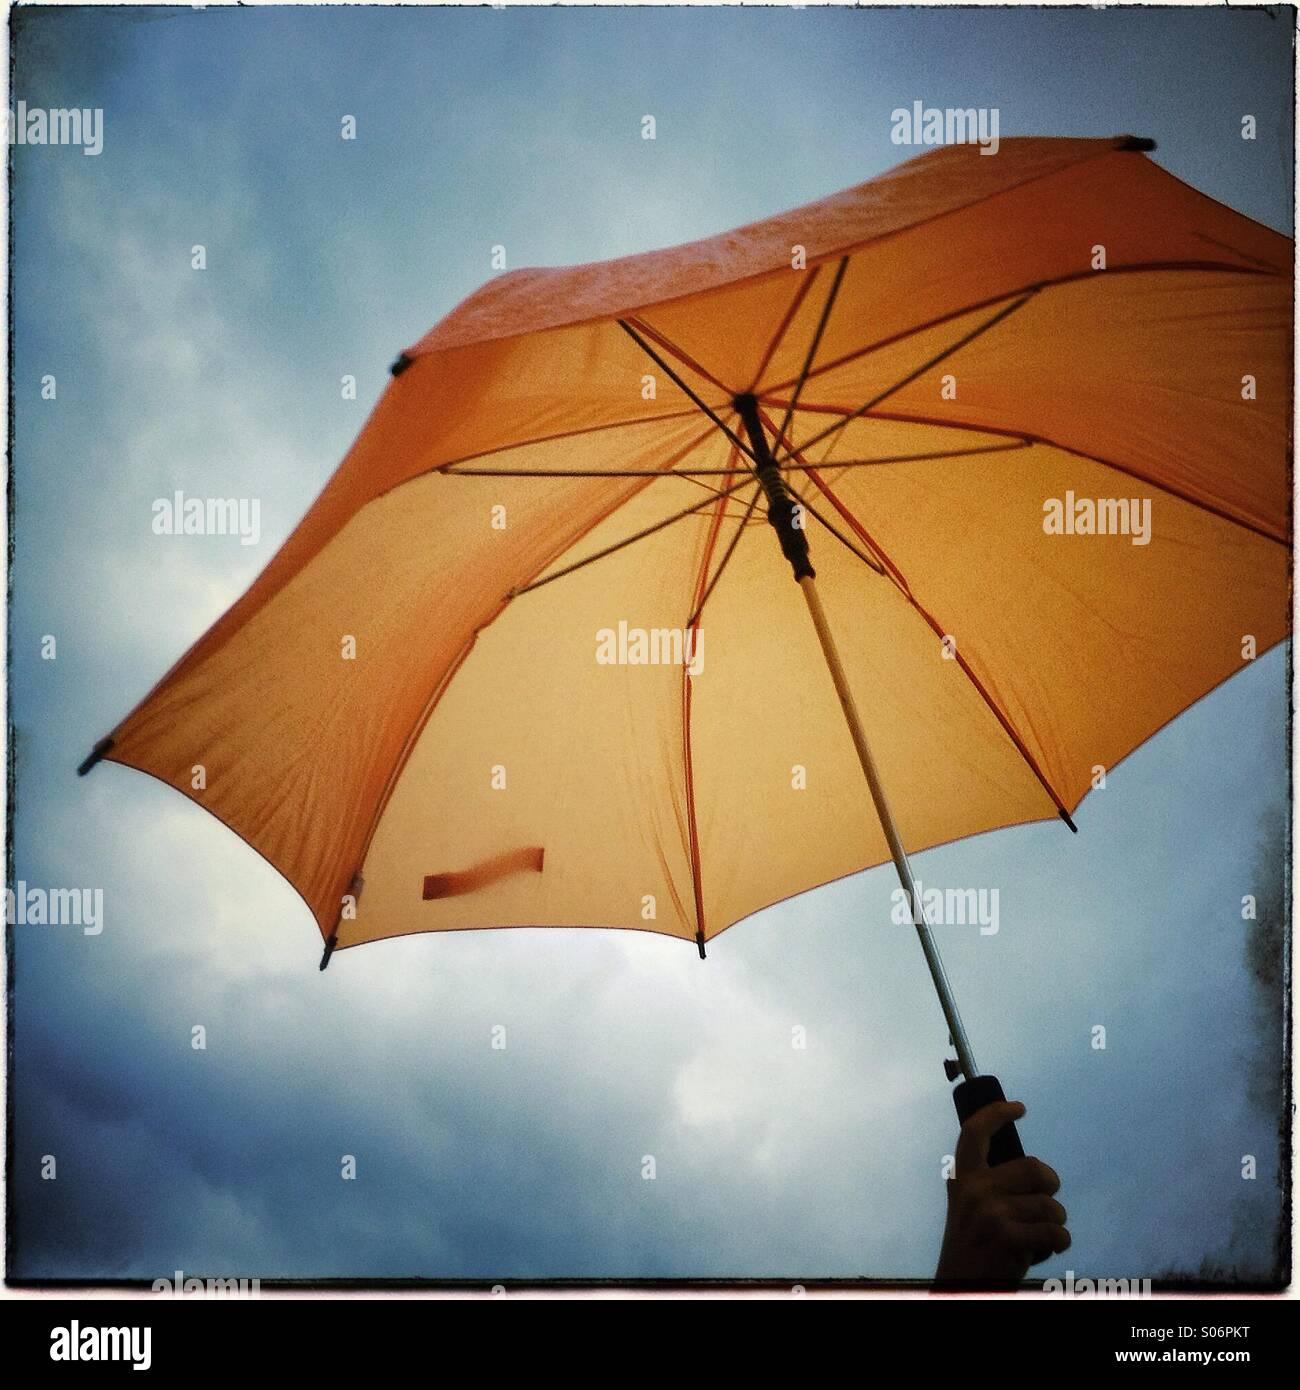 Open orange umbrella isolated on cloudy sky background - Stock Image